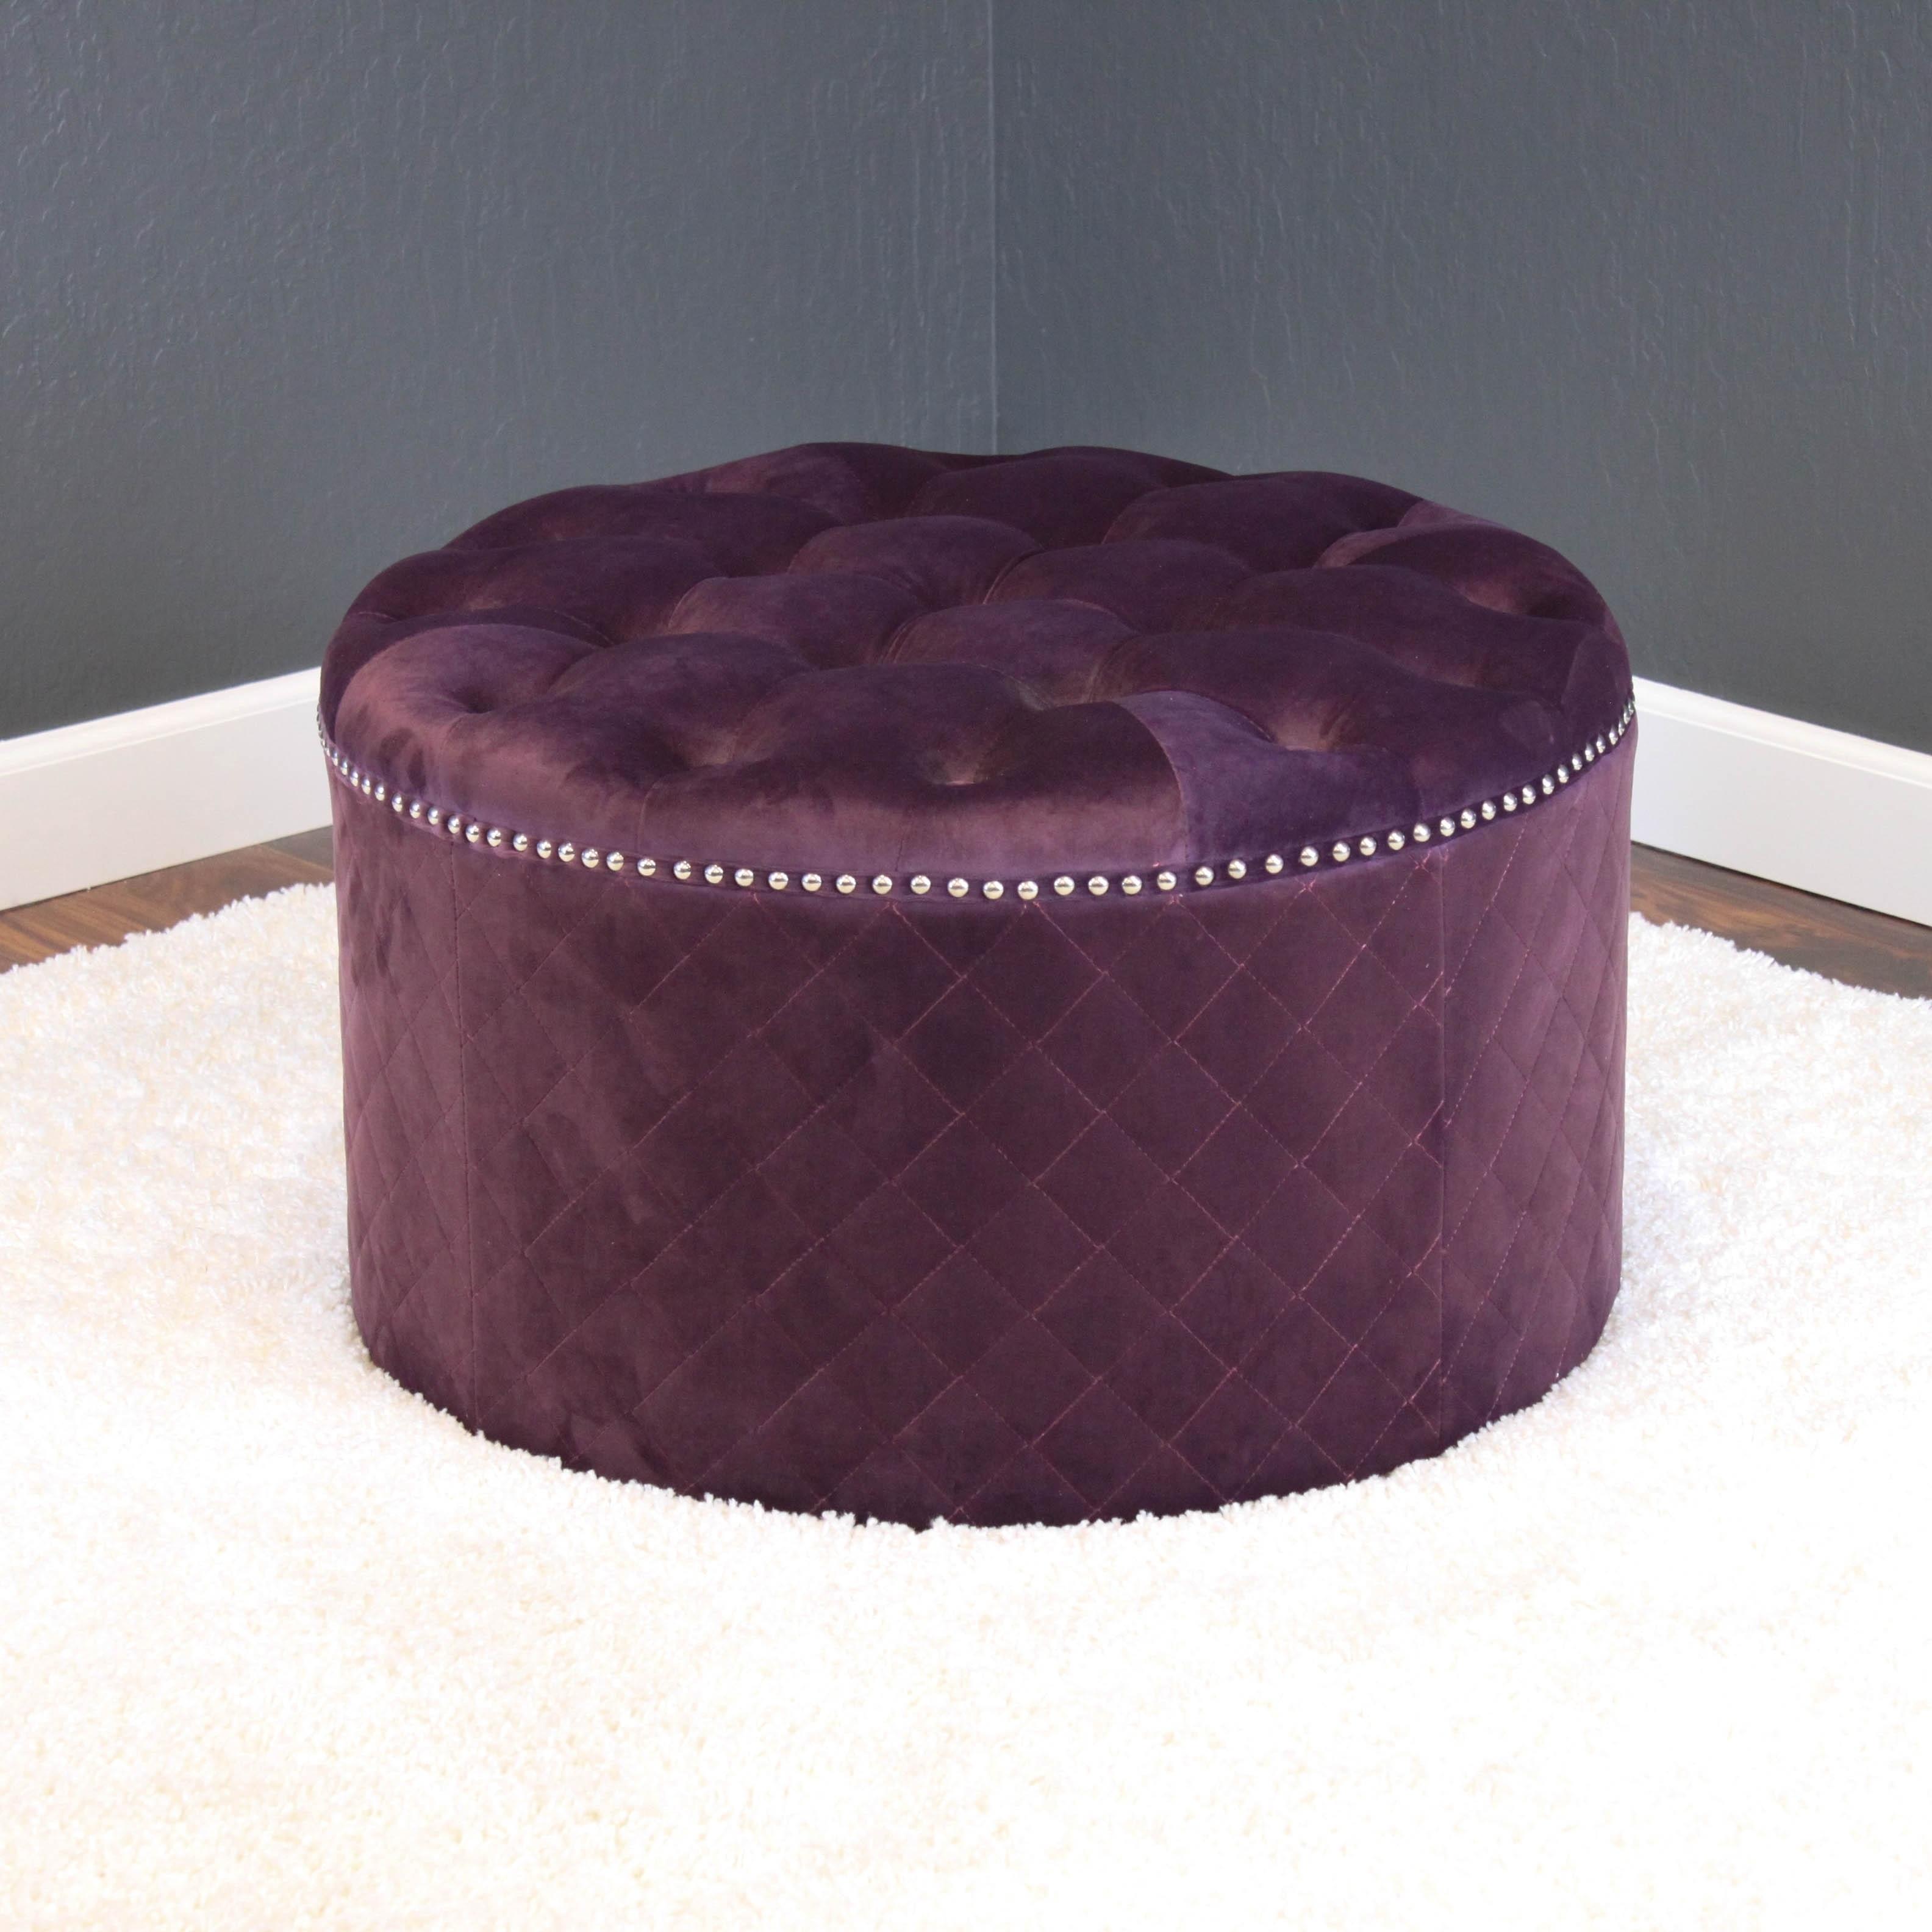 Buy Purple Ottomans U0026 Storage Ottomans Online At Overstock.com | Our Best  Living Room Furniture Deals